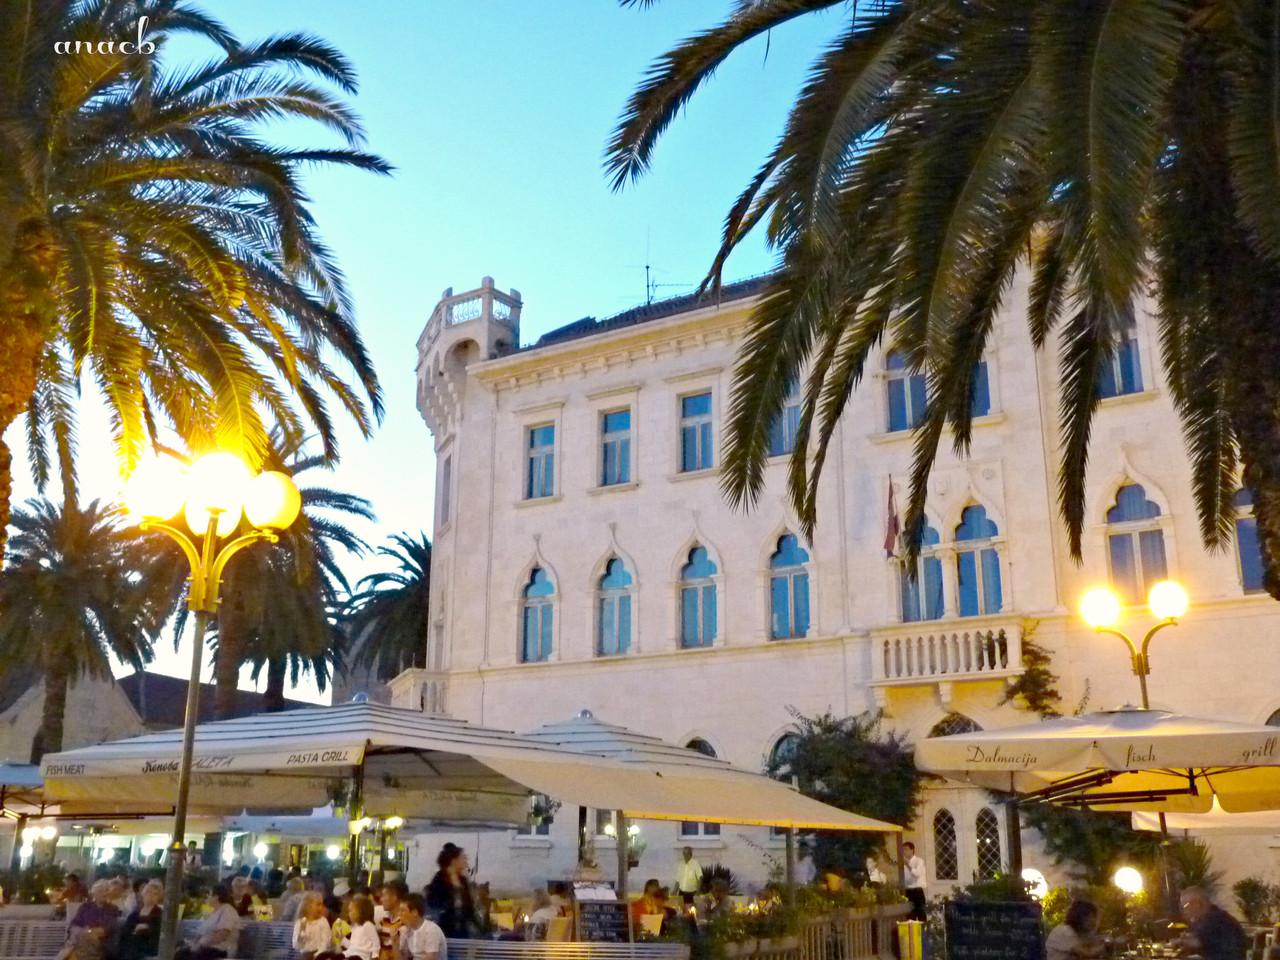 Trogir - Lucic palace - viajarporquesim.blogs.pt.j